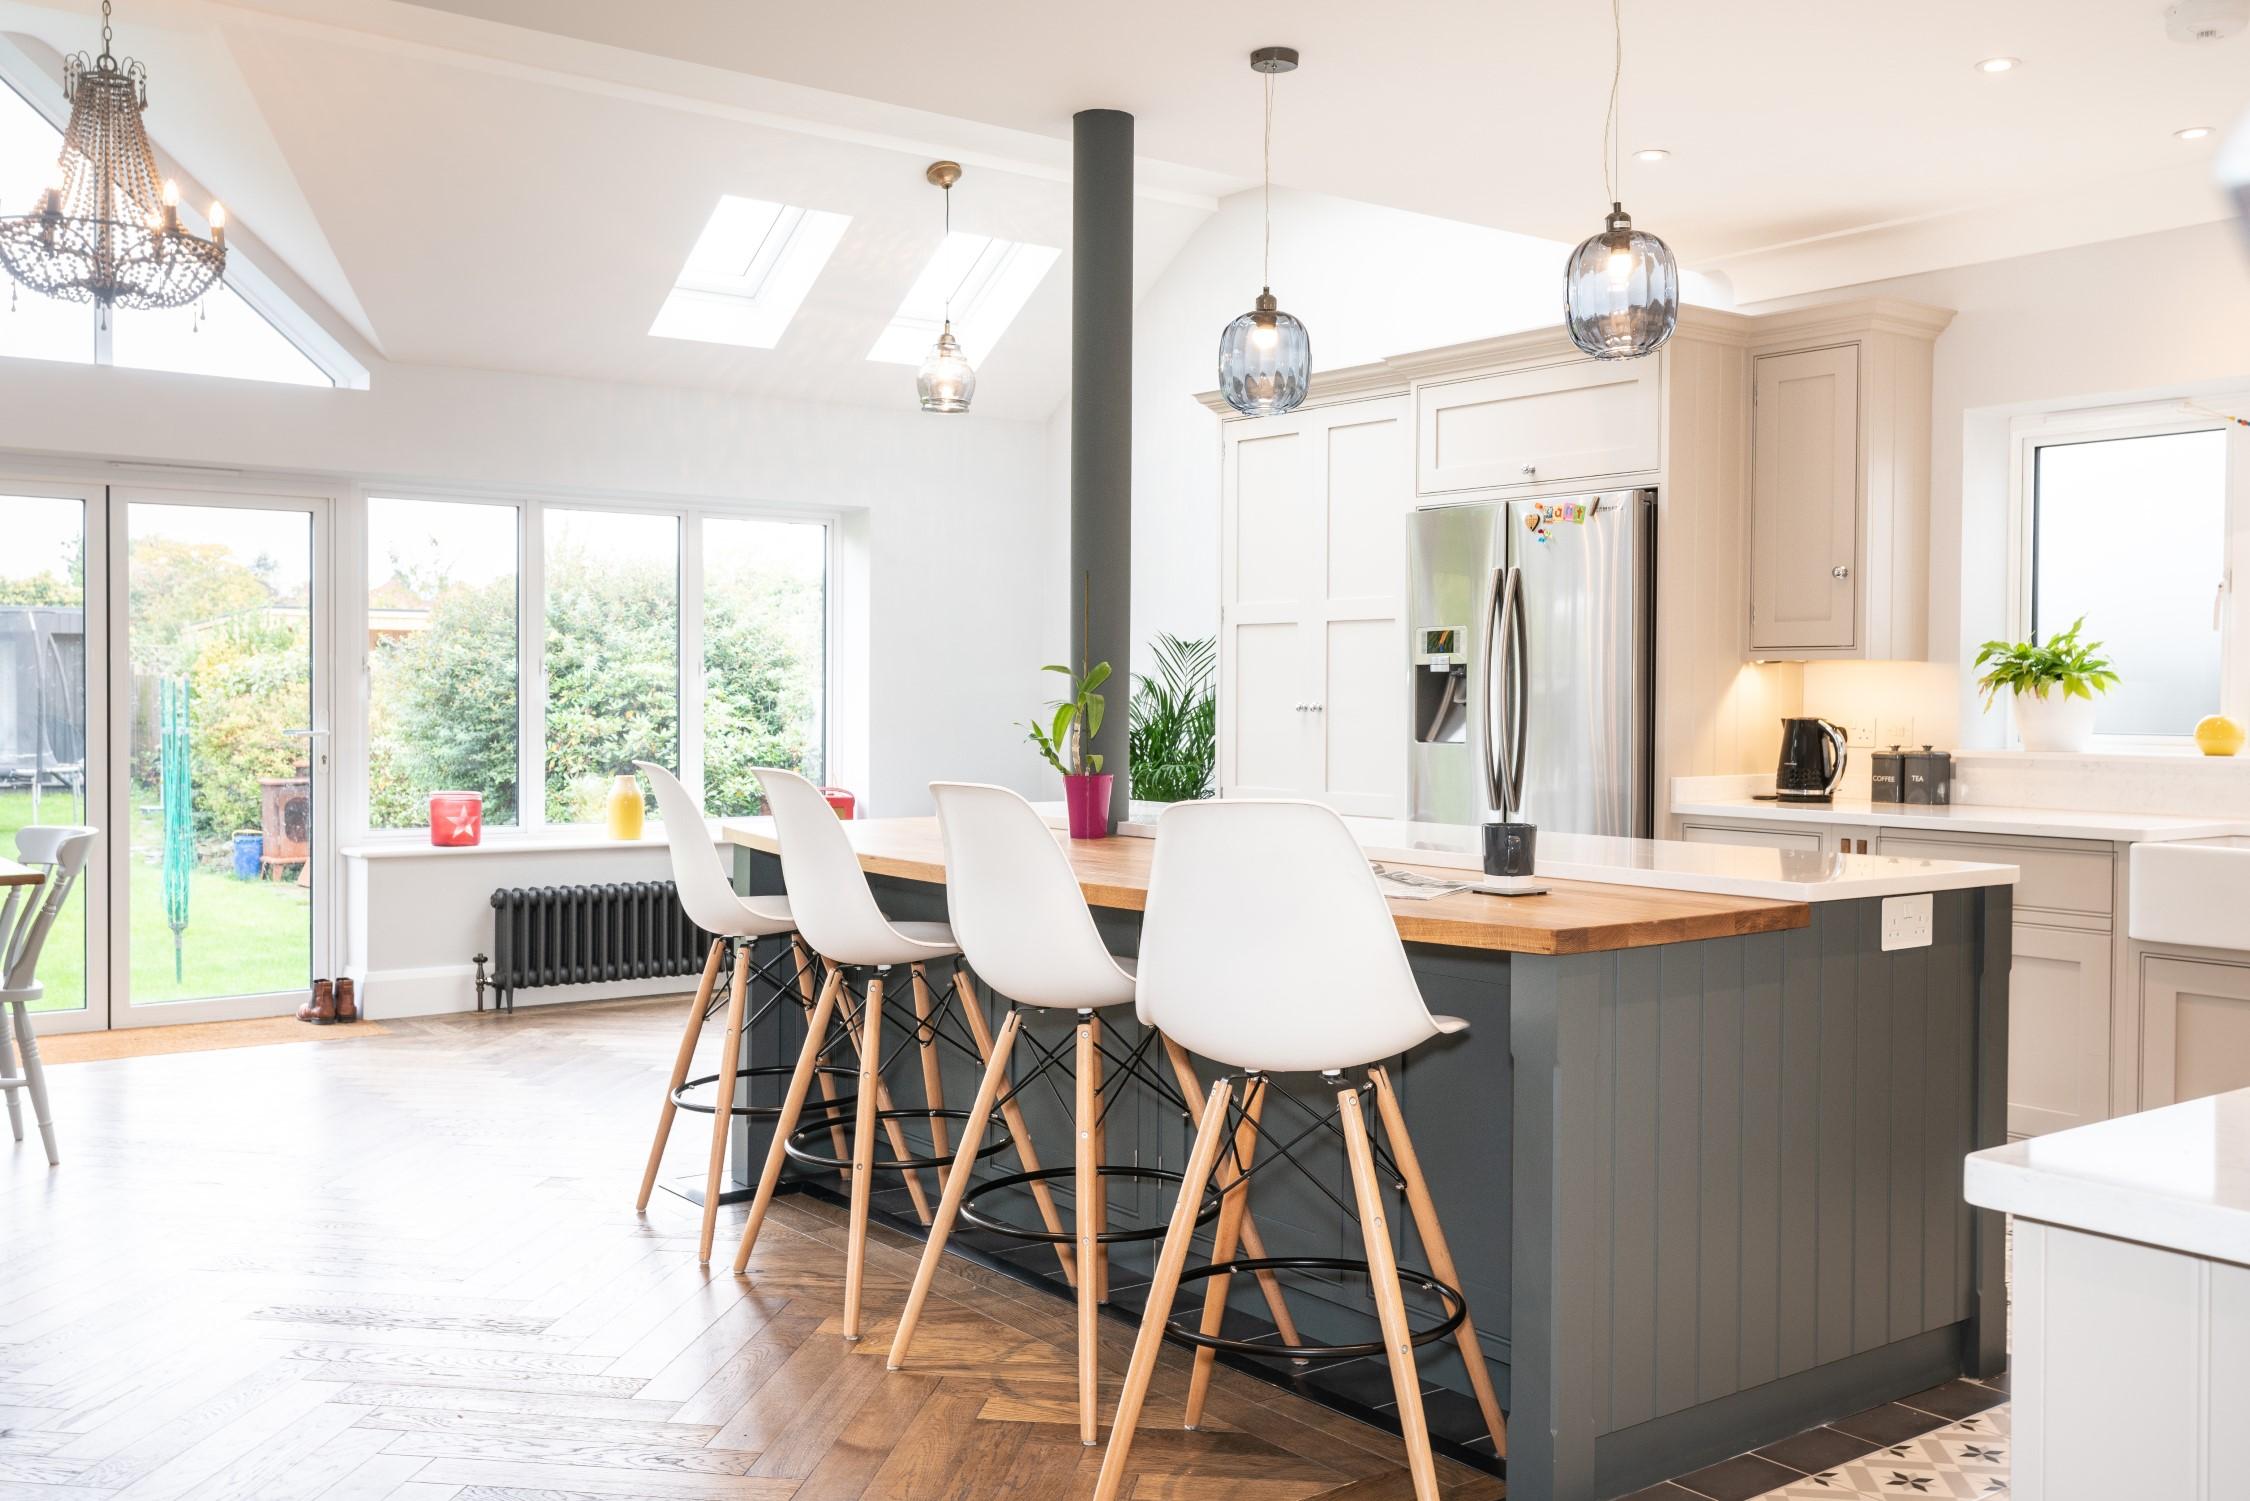 Herringbone Flooring in a Handmade Kitchen   Nicholas Bridger